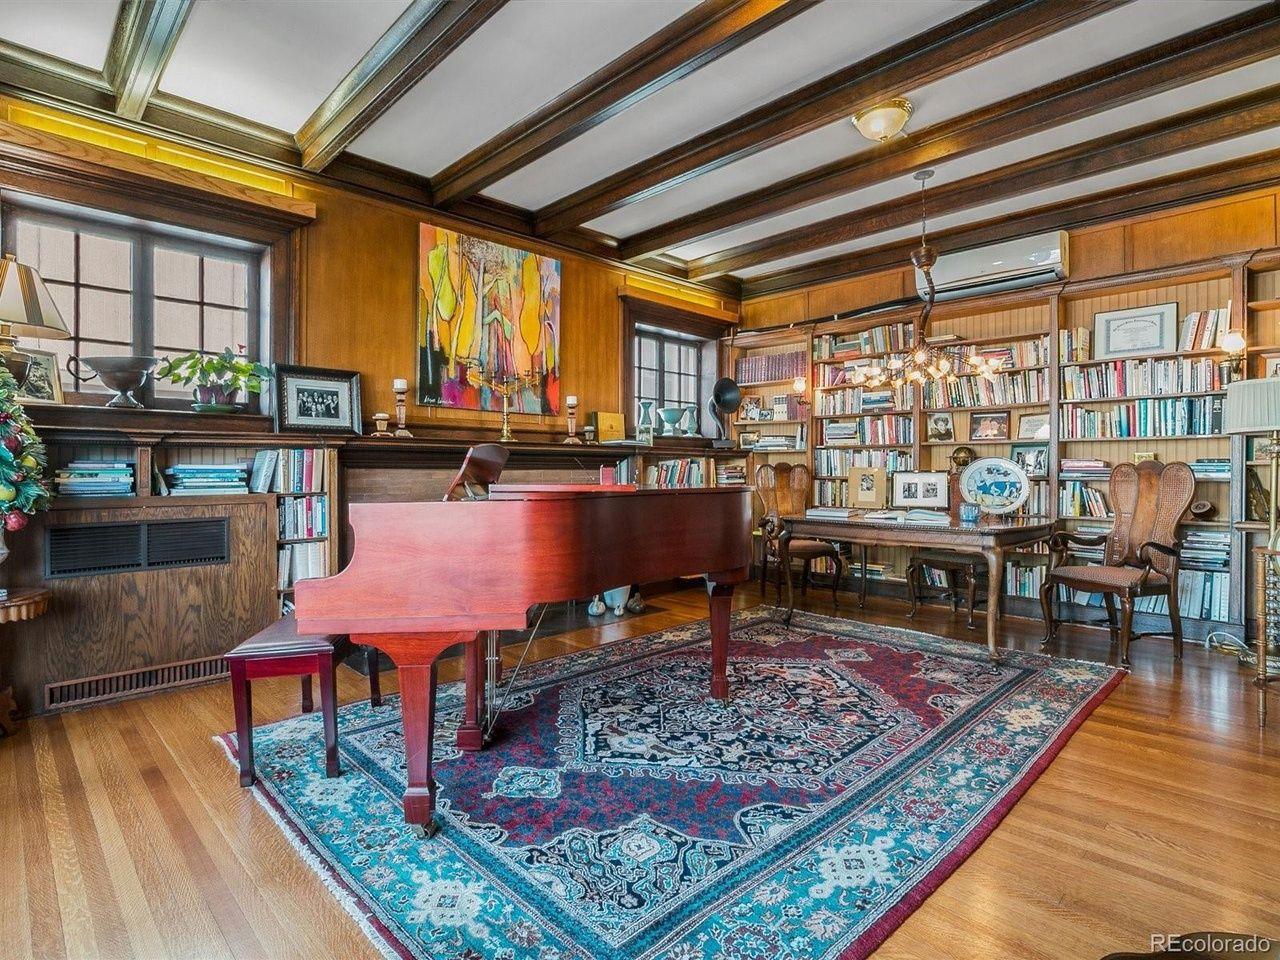 1350 N. Logan St formal sitting room